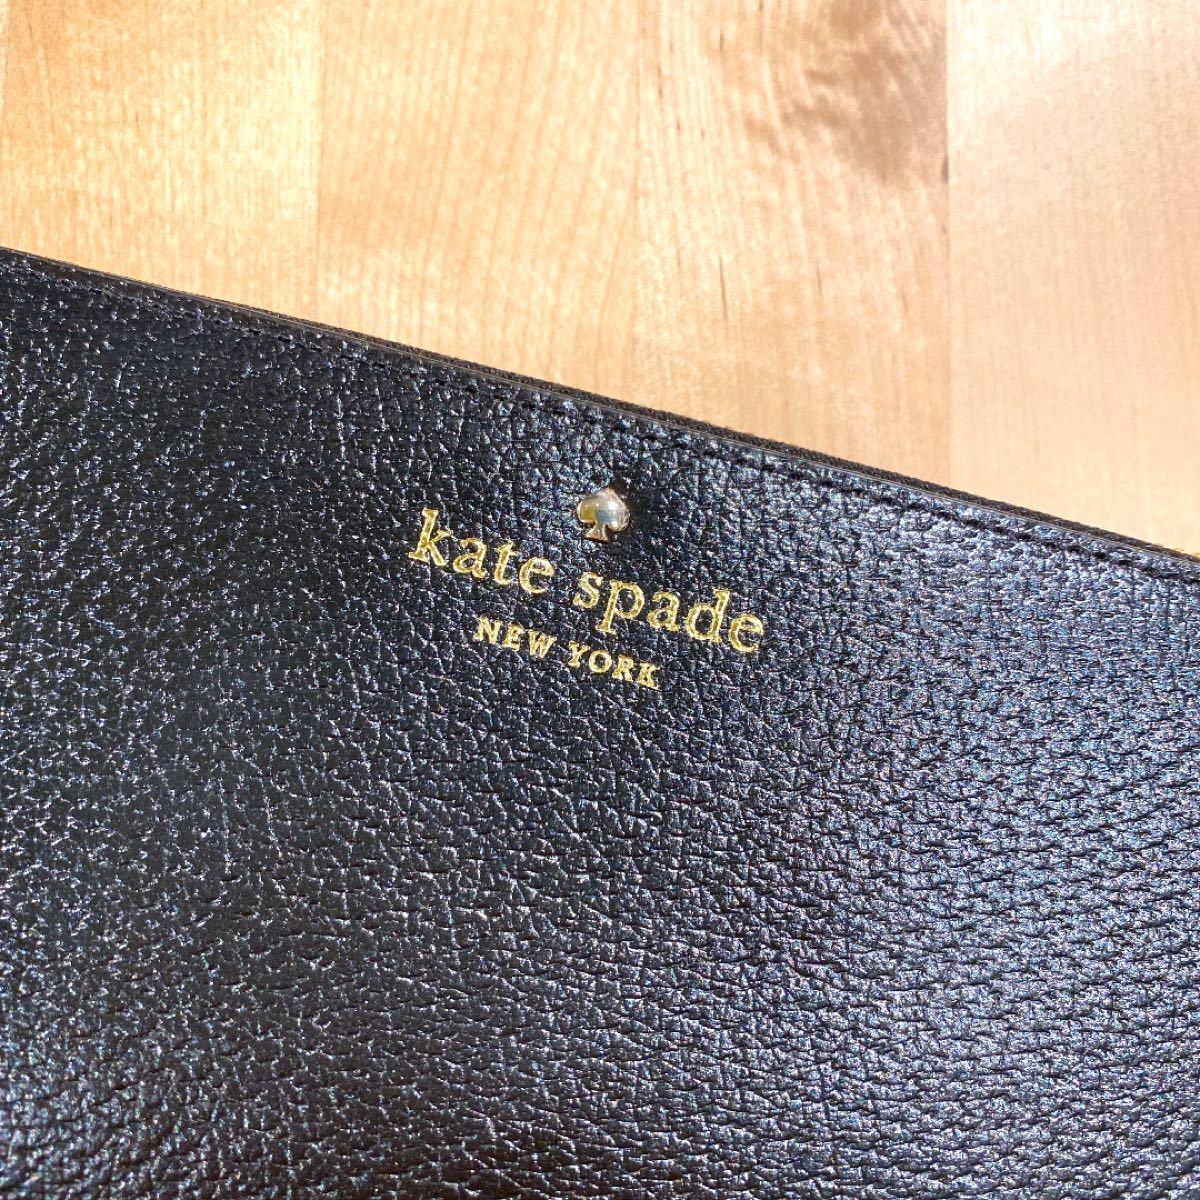 ☆kate spade new york☆長財布/ブラック/新品・未使用♪